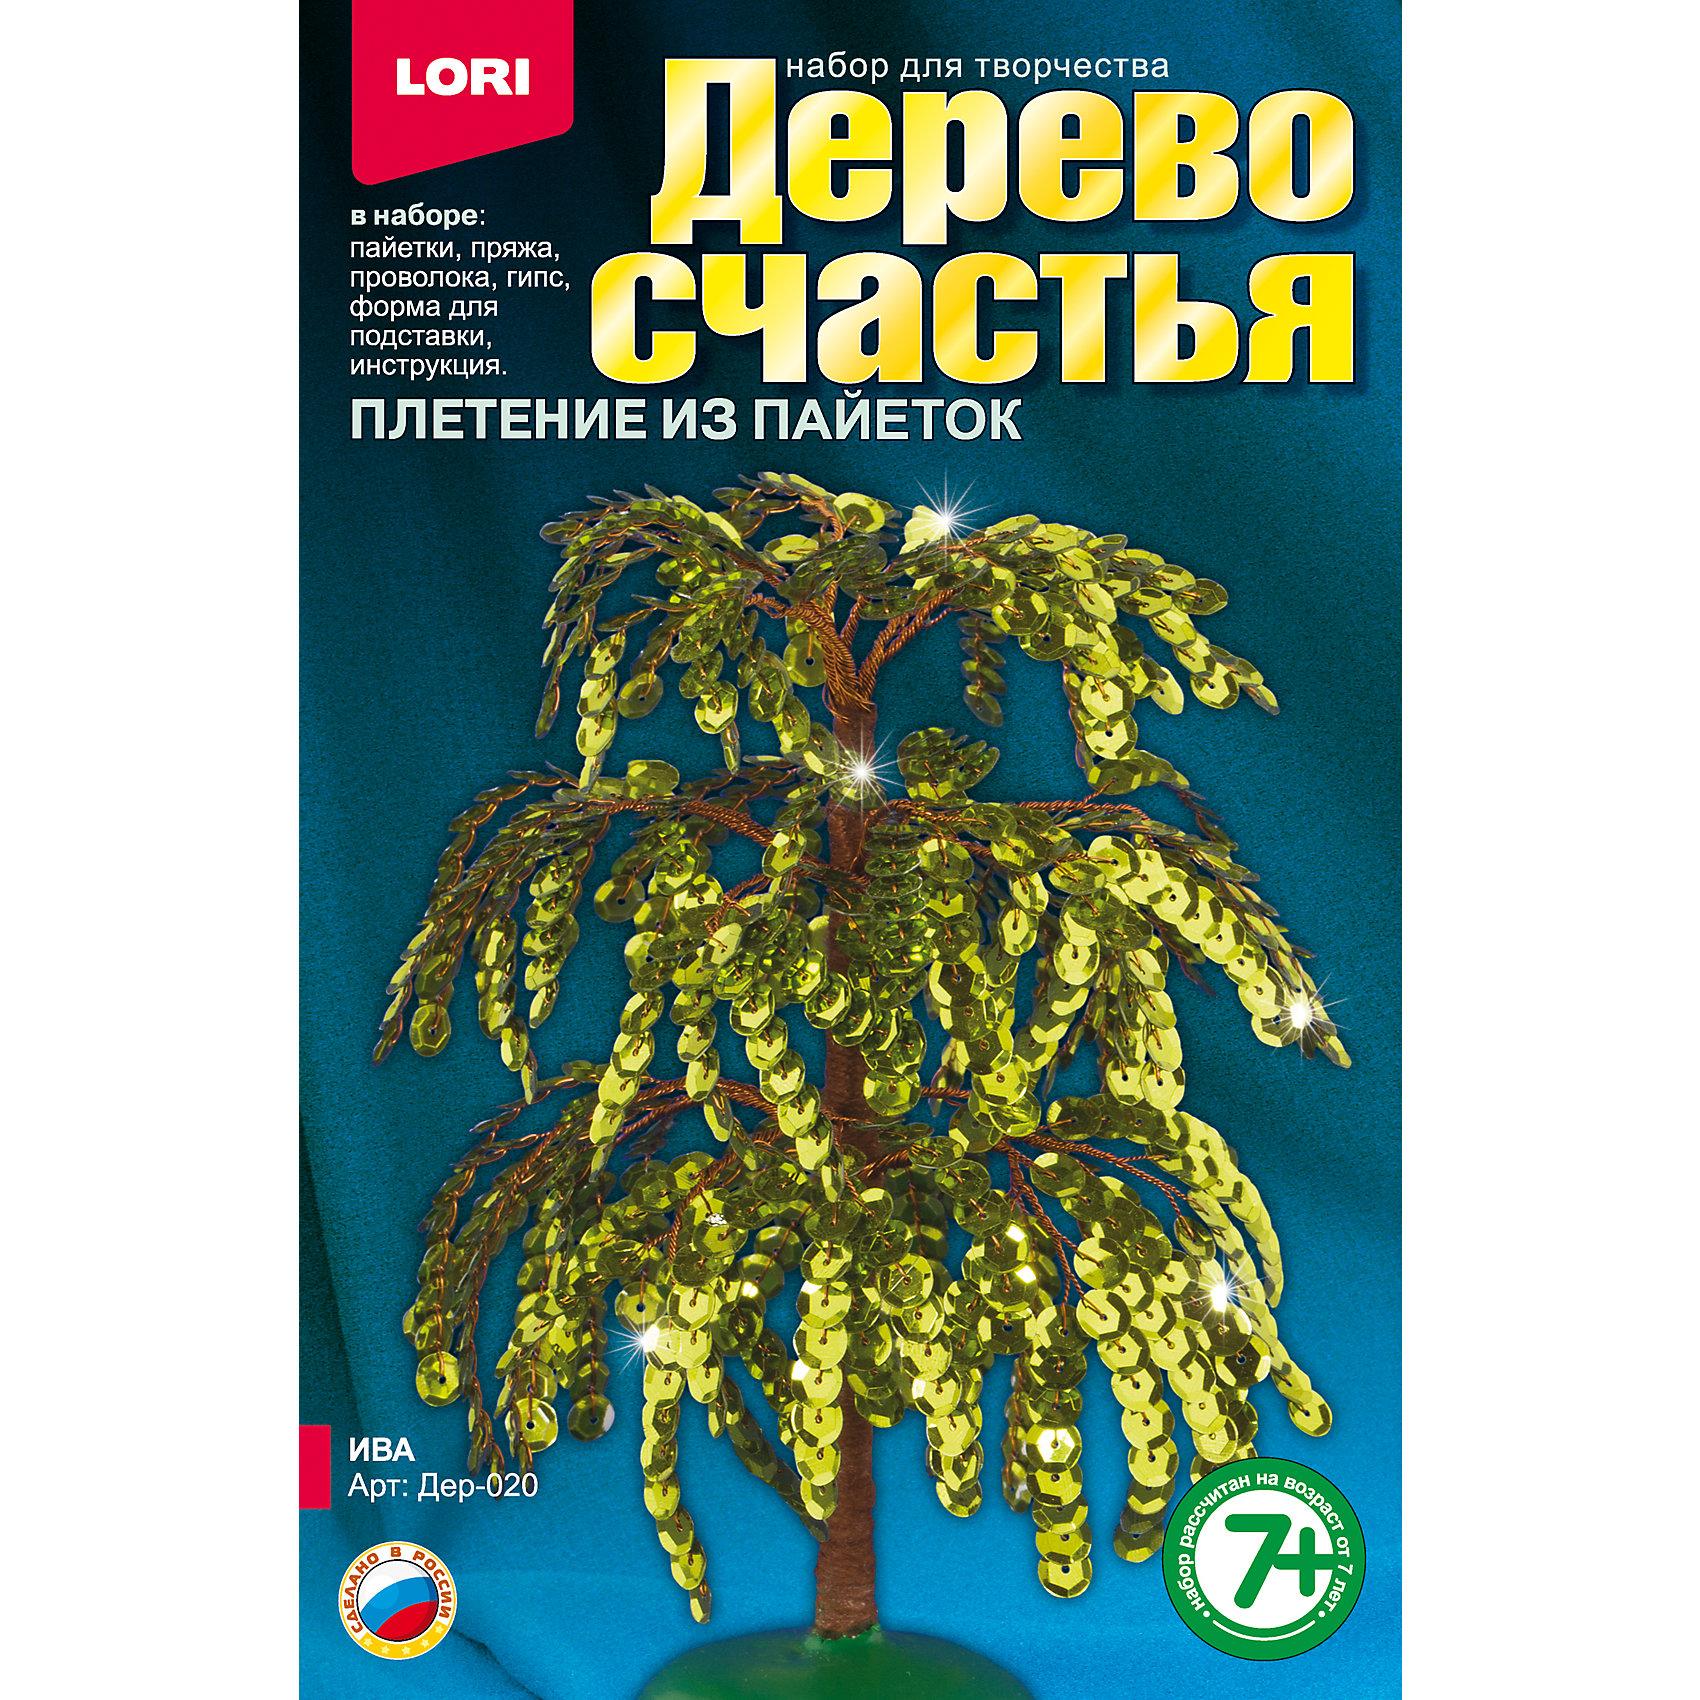 LORI Дерево счастья Ива lori фоторамки из гипса на клумбе